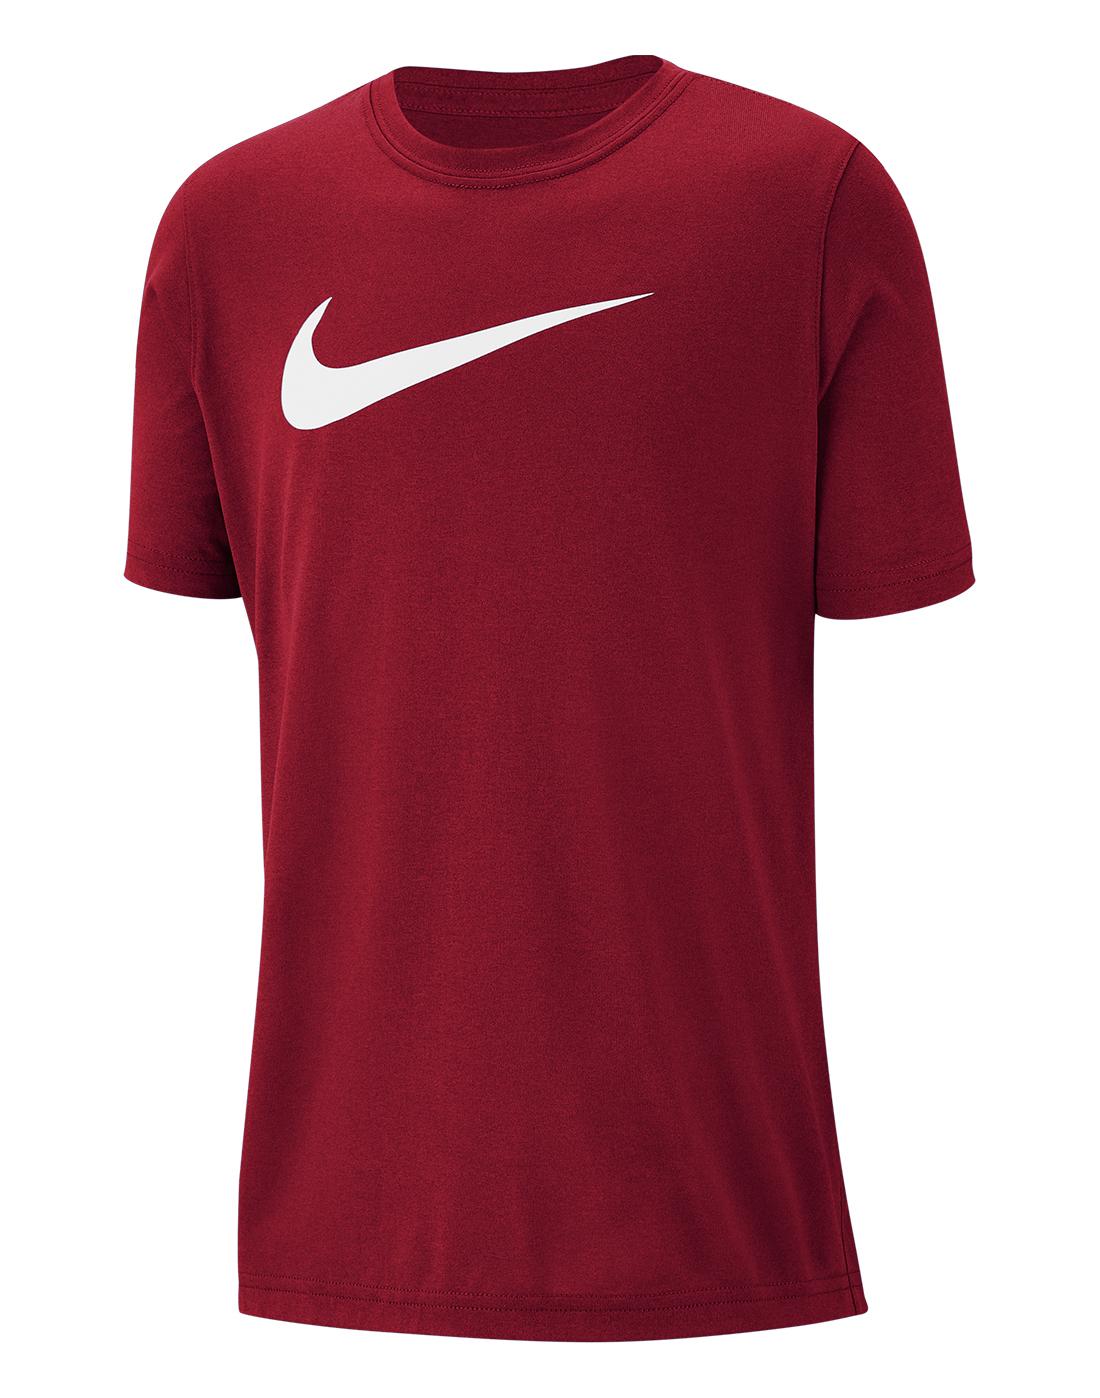 01b748b0cf6 Nike Older Boys Dry Swoosh T-Shirt | Life Style Sports